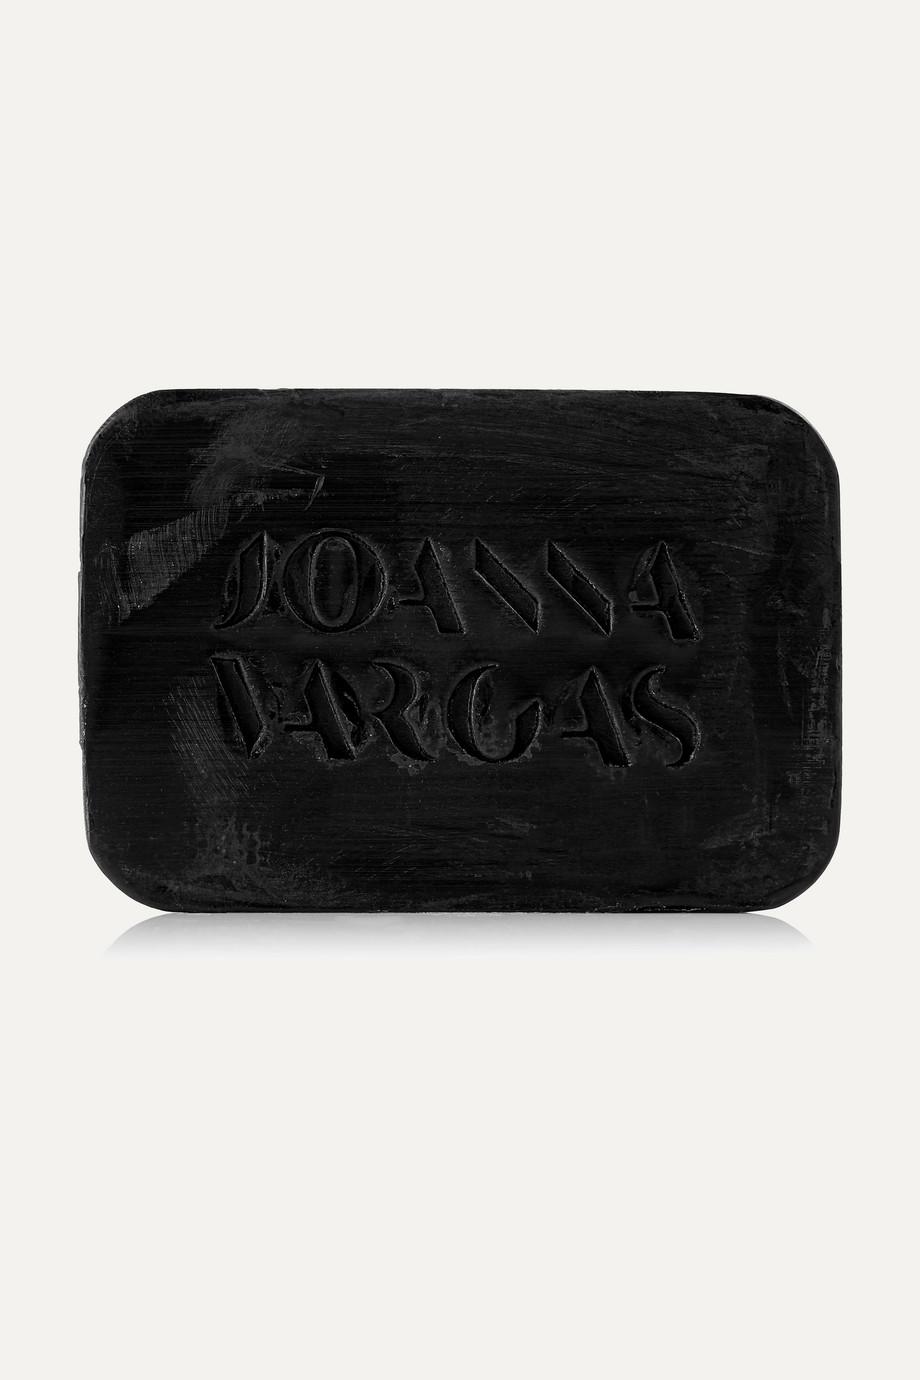 Joanna Vargas Miracle Bar, 100 g – Seife